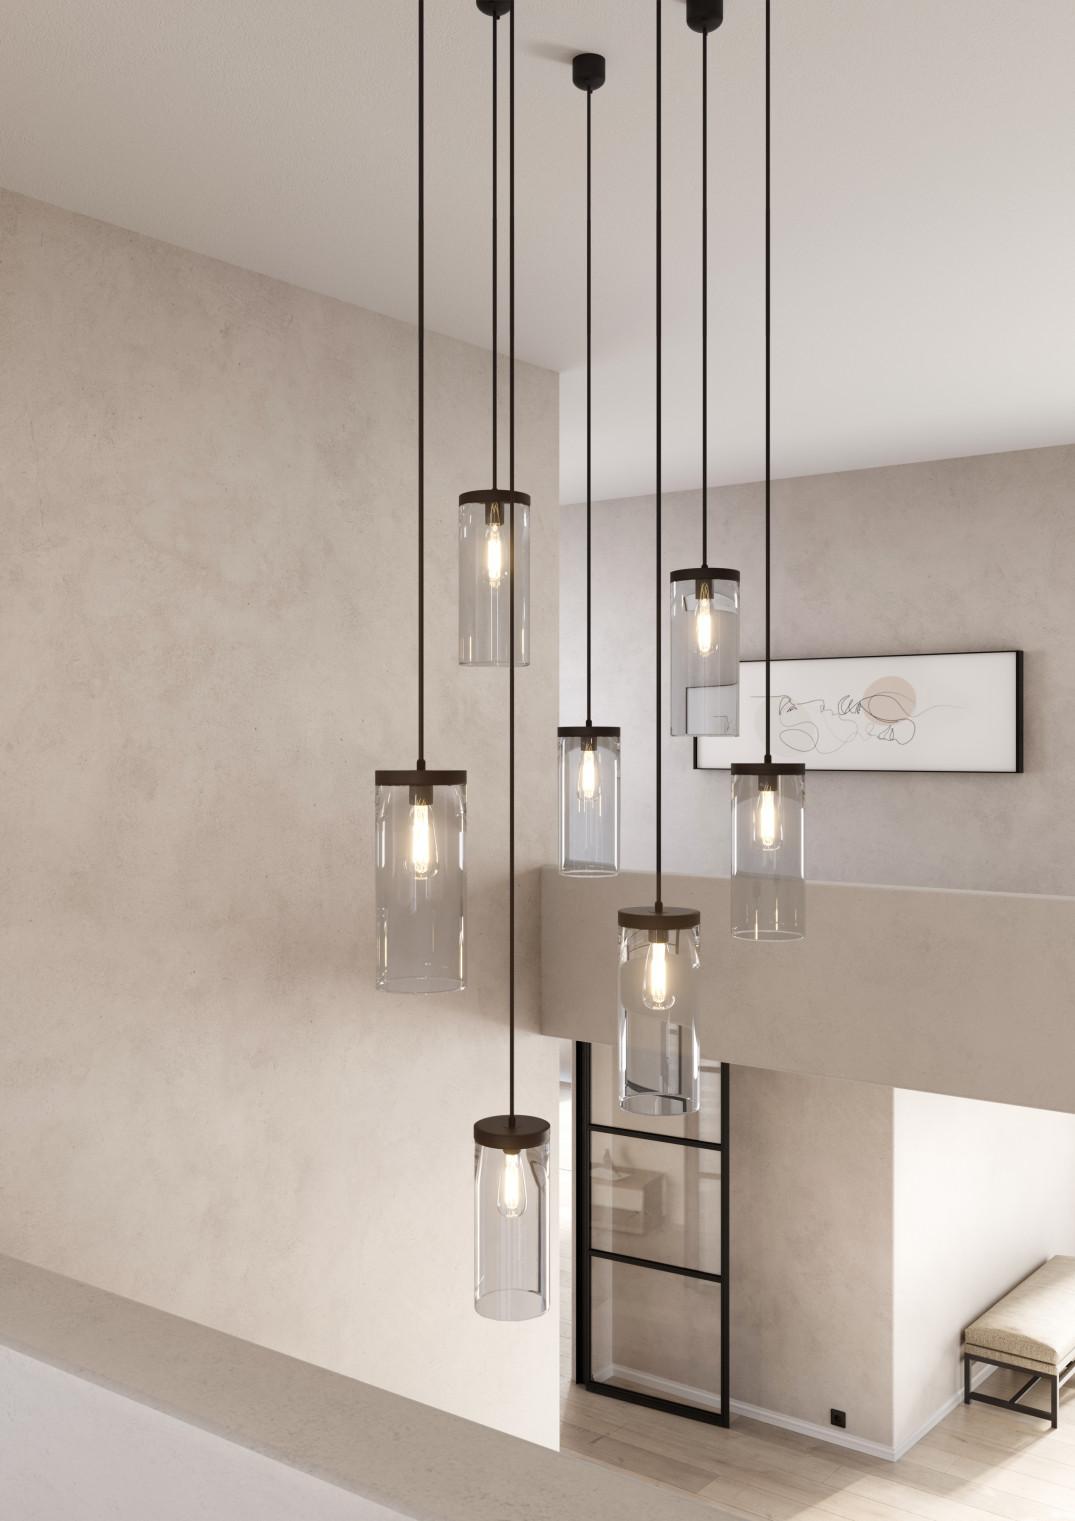 PSM_Lampen_HALL LAMP 9 POST